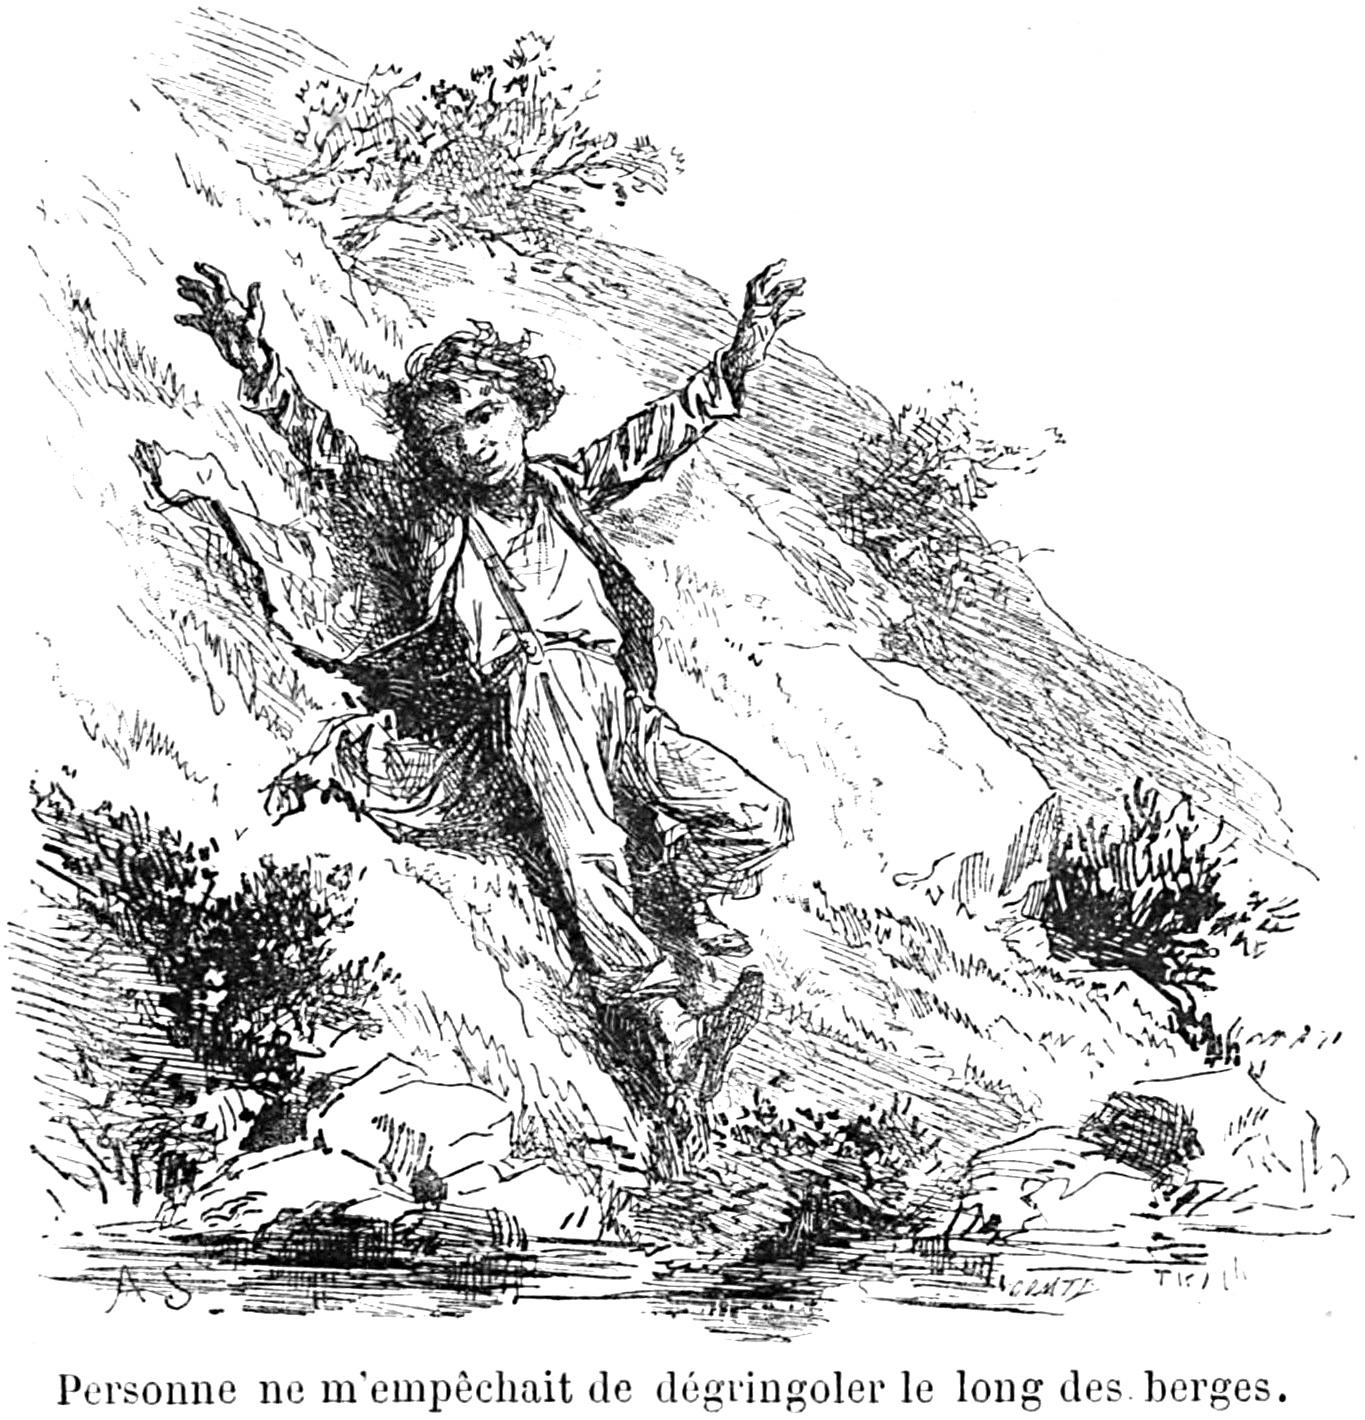 Man Vs Nature In Huckleberry Finn